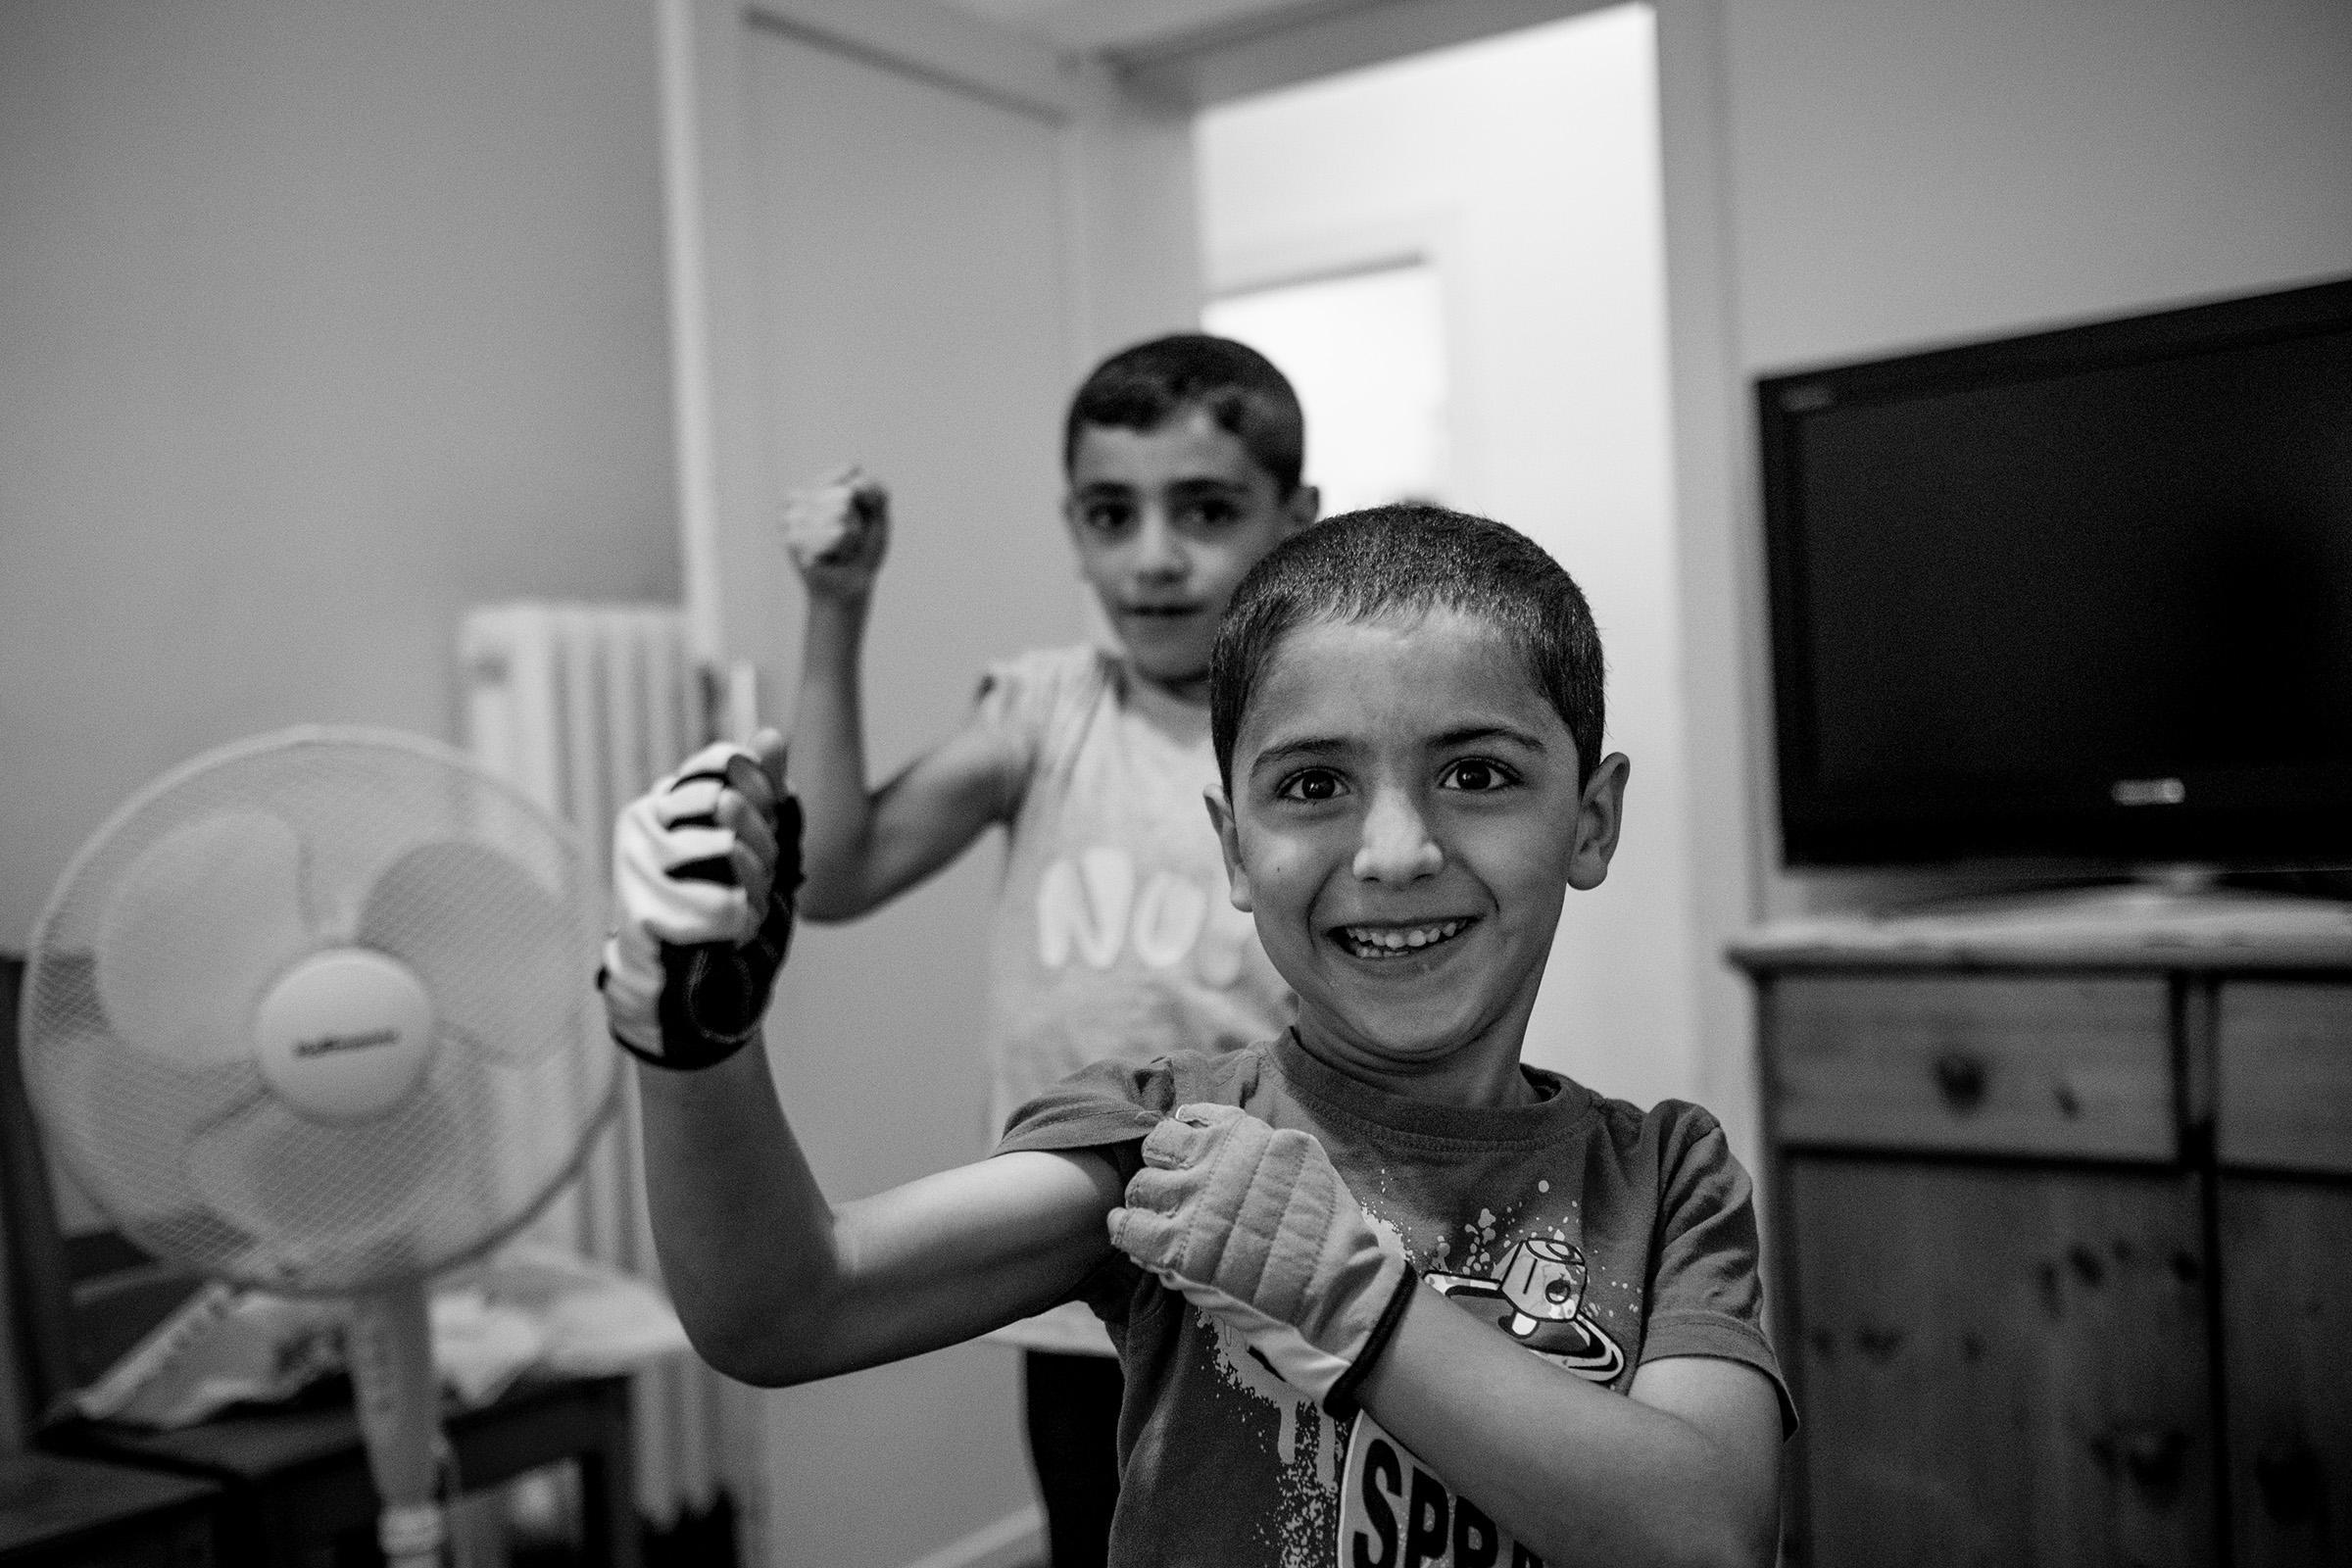 fluechtlinge-syrien-berlin-asyl-integration-brueder